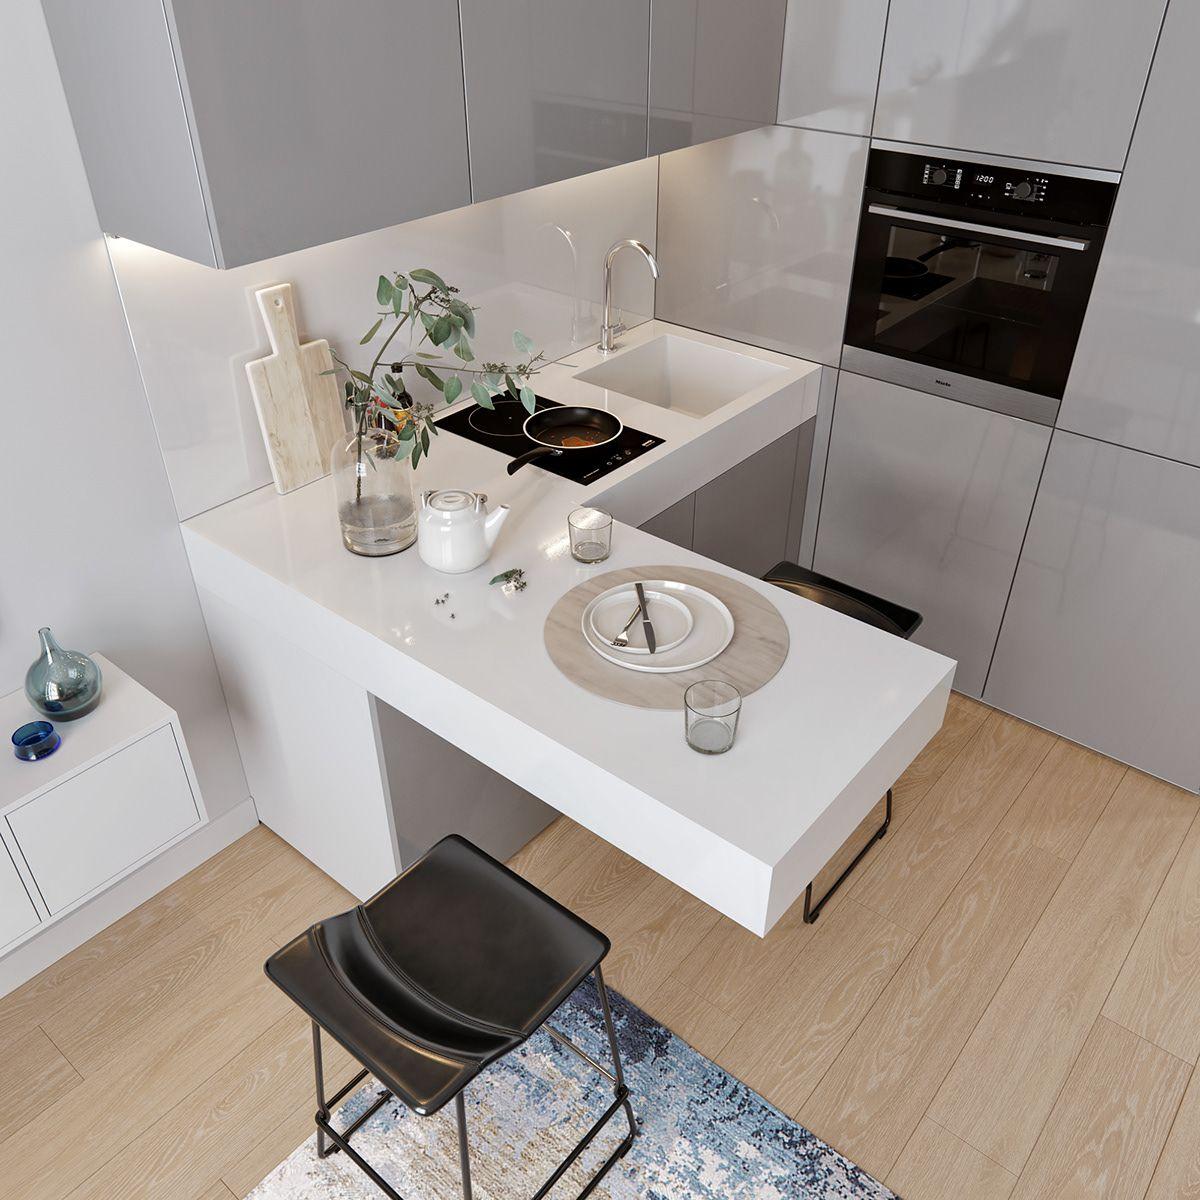 Pictures of Idee Deco Cuisine Petite Surface